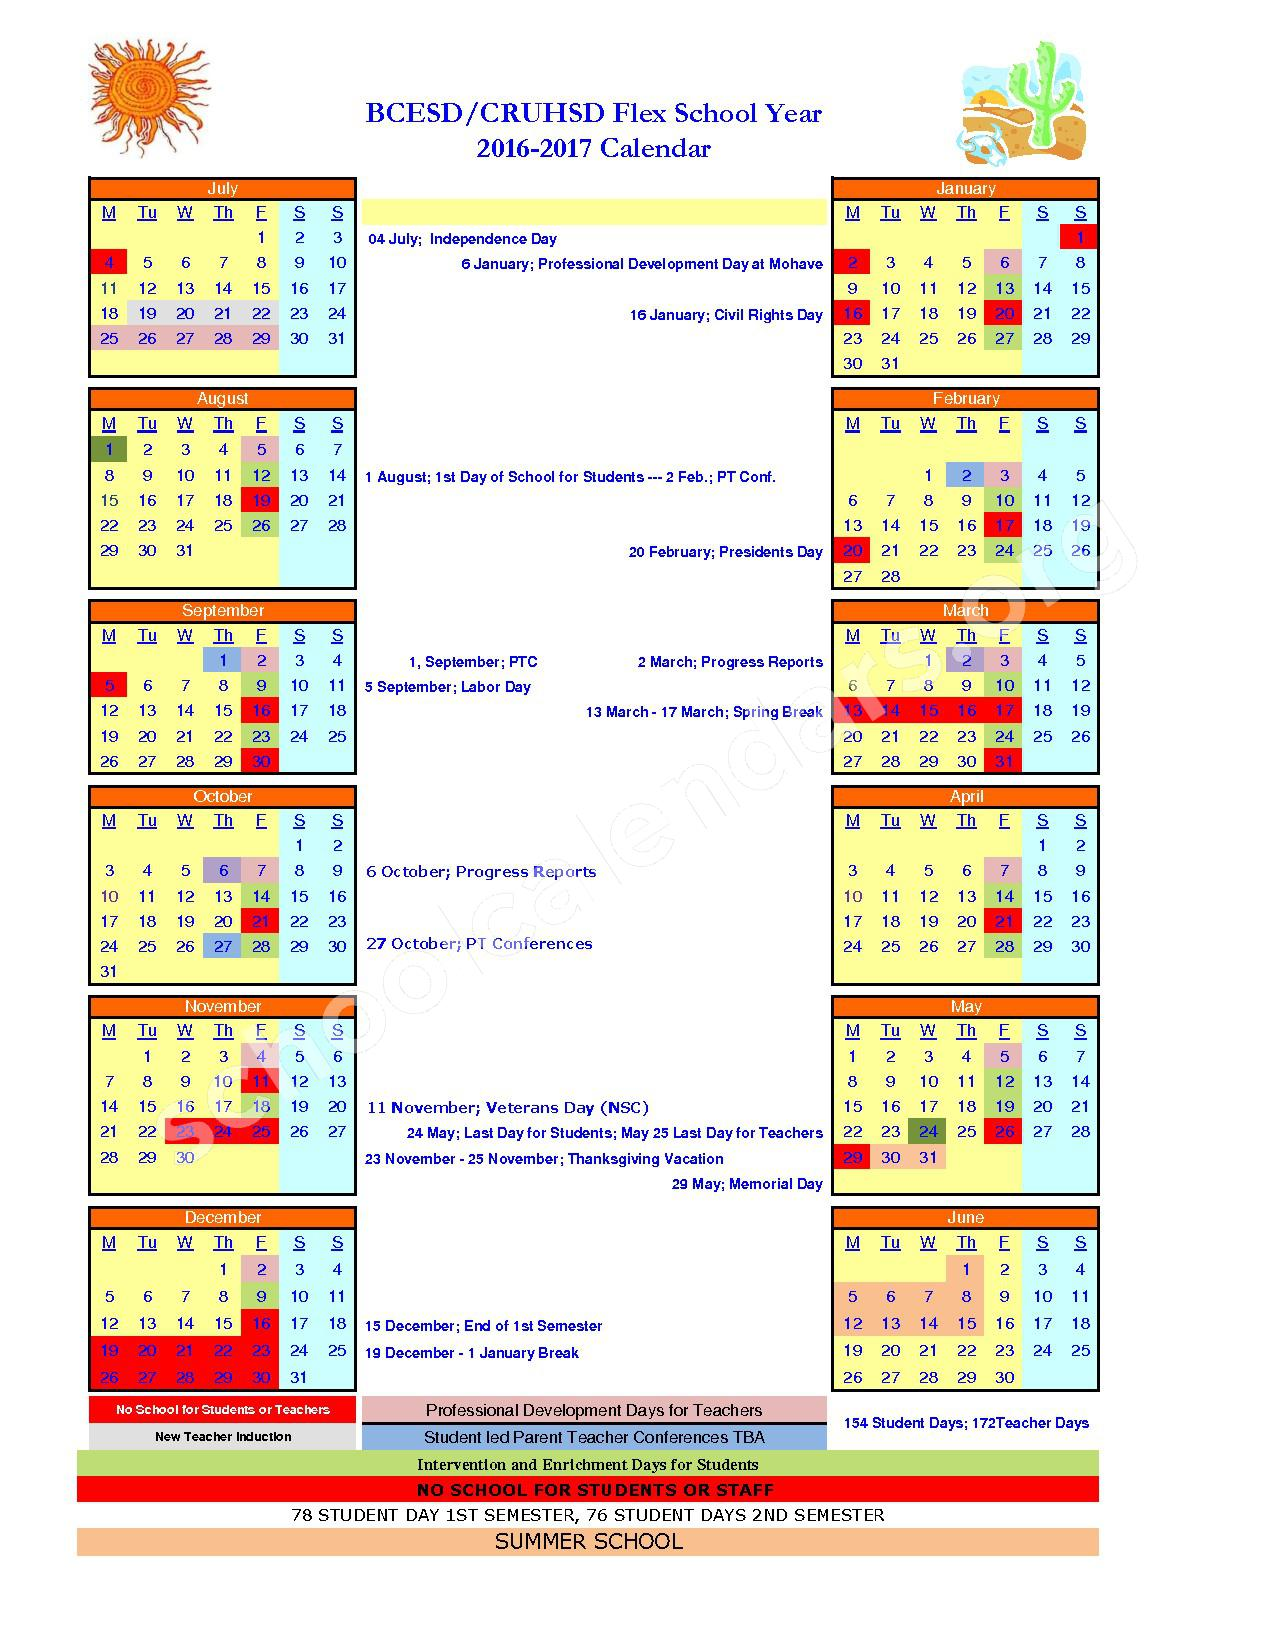 2016 - 2017 Flex School Year Calendar – Coyote Canyon School – page 1